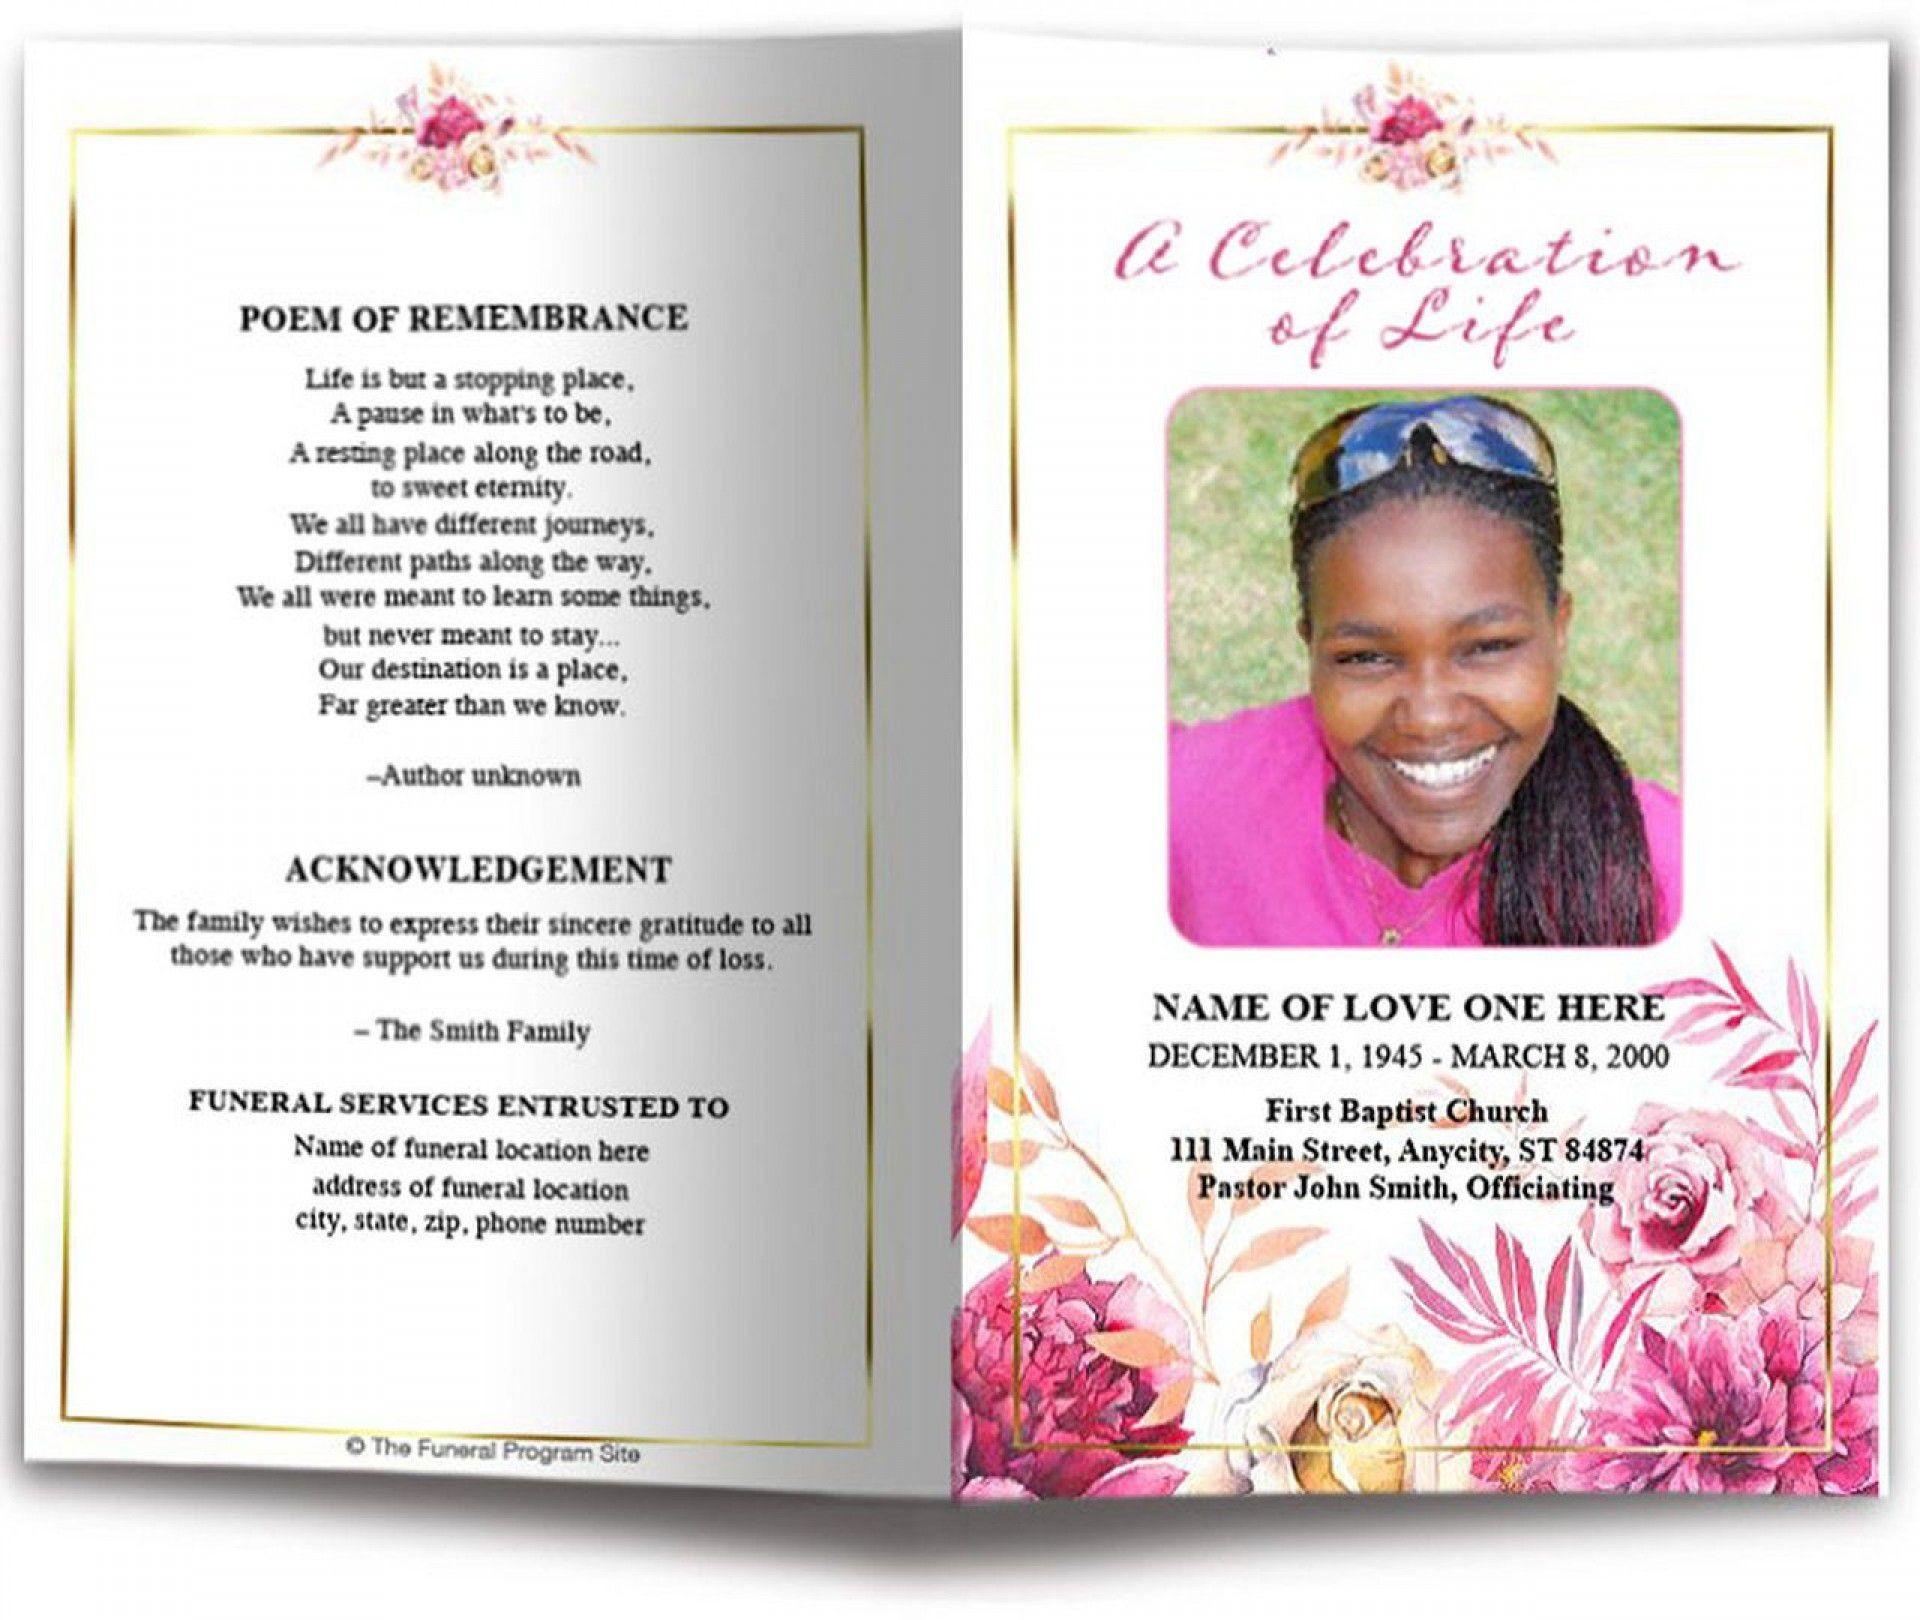 003 Sensational Free Funeral Program Template Download High Definition  2010 Downloadable Editable Pdf Blank1920